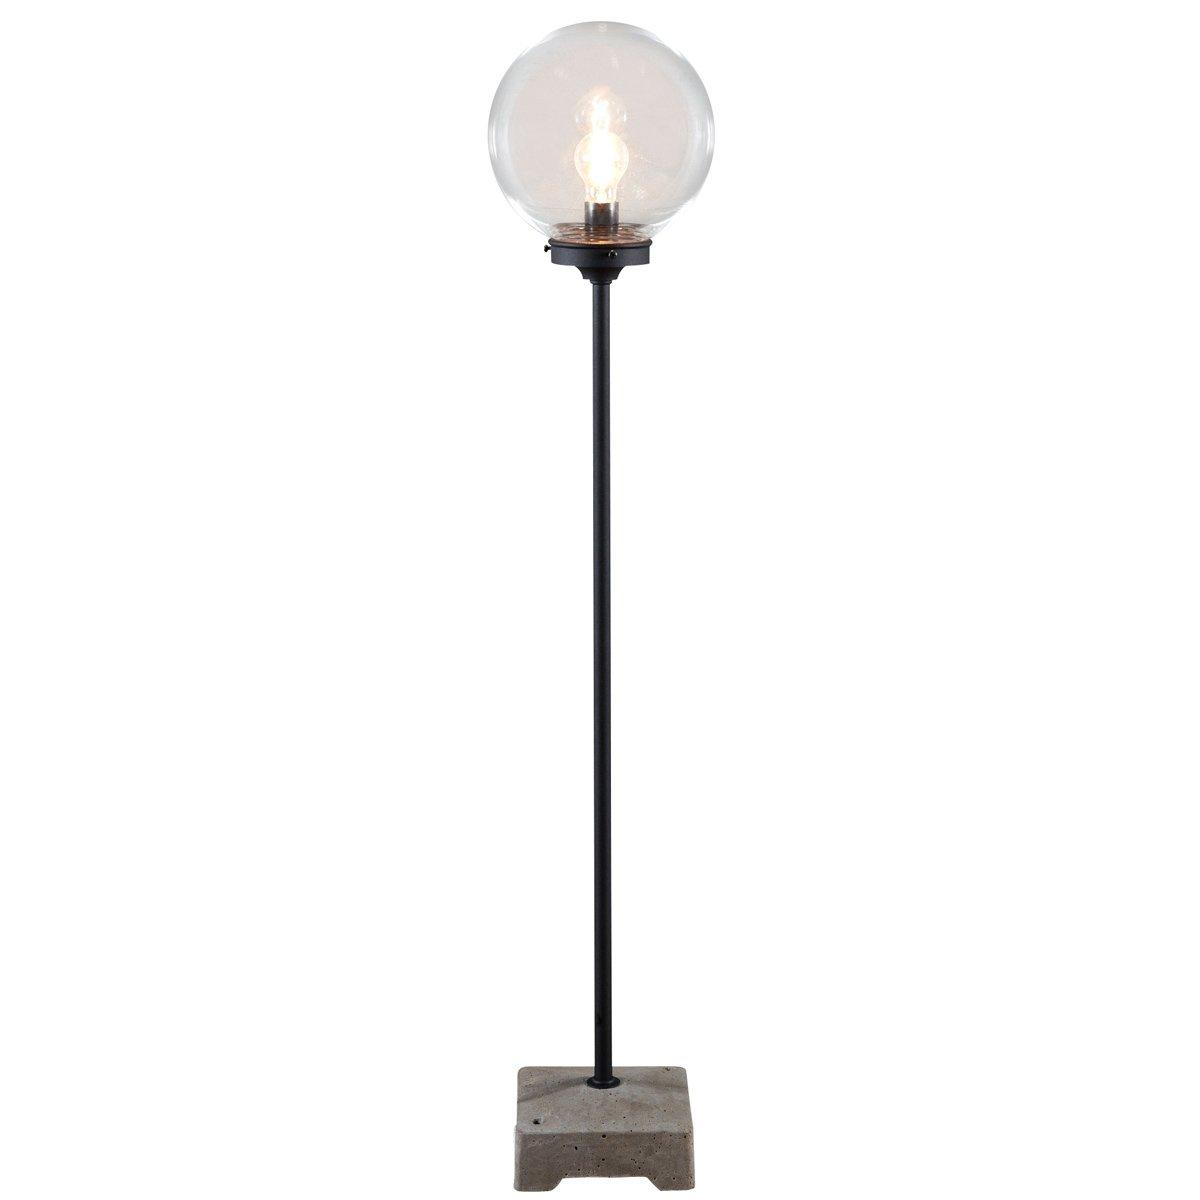 Konstsmide 455-750 Lodi Standing Terrace-Patio Light / 1.29 m High / Clear Glass Globe / Matt Black